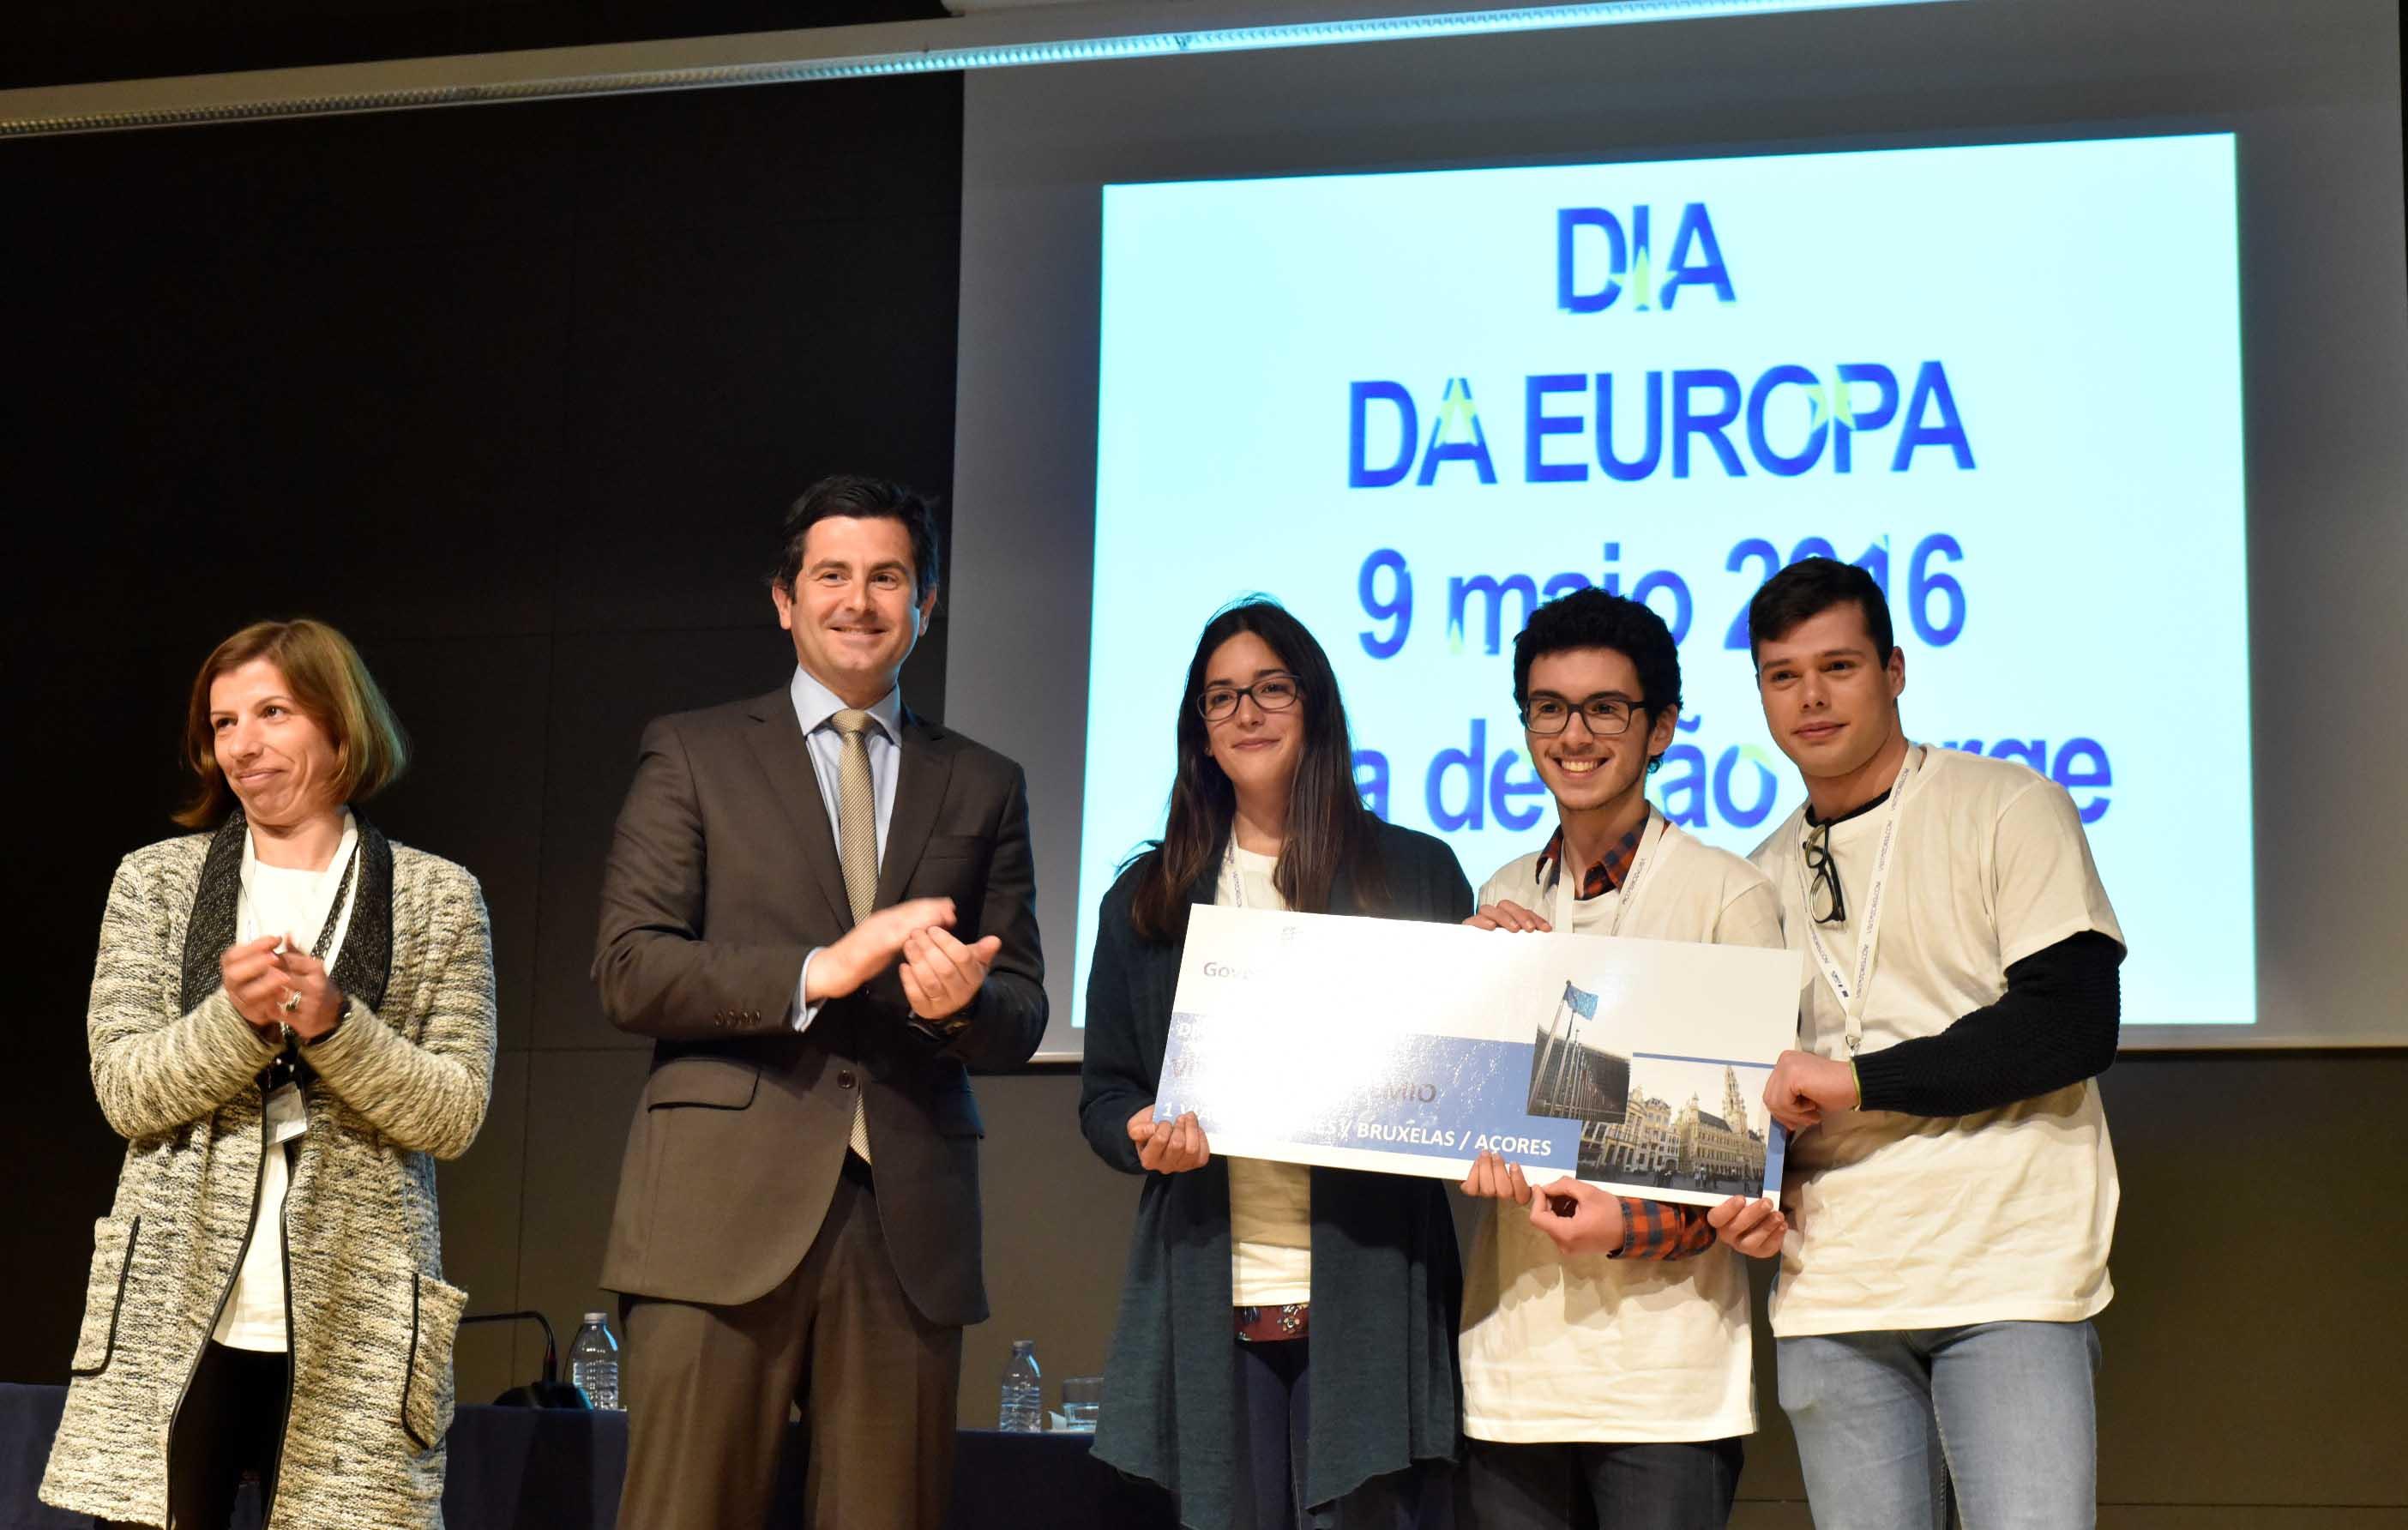 Governo dos Açores promove visita de jovens estudantes do Faial a Bruxelas